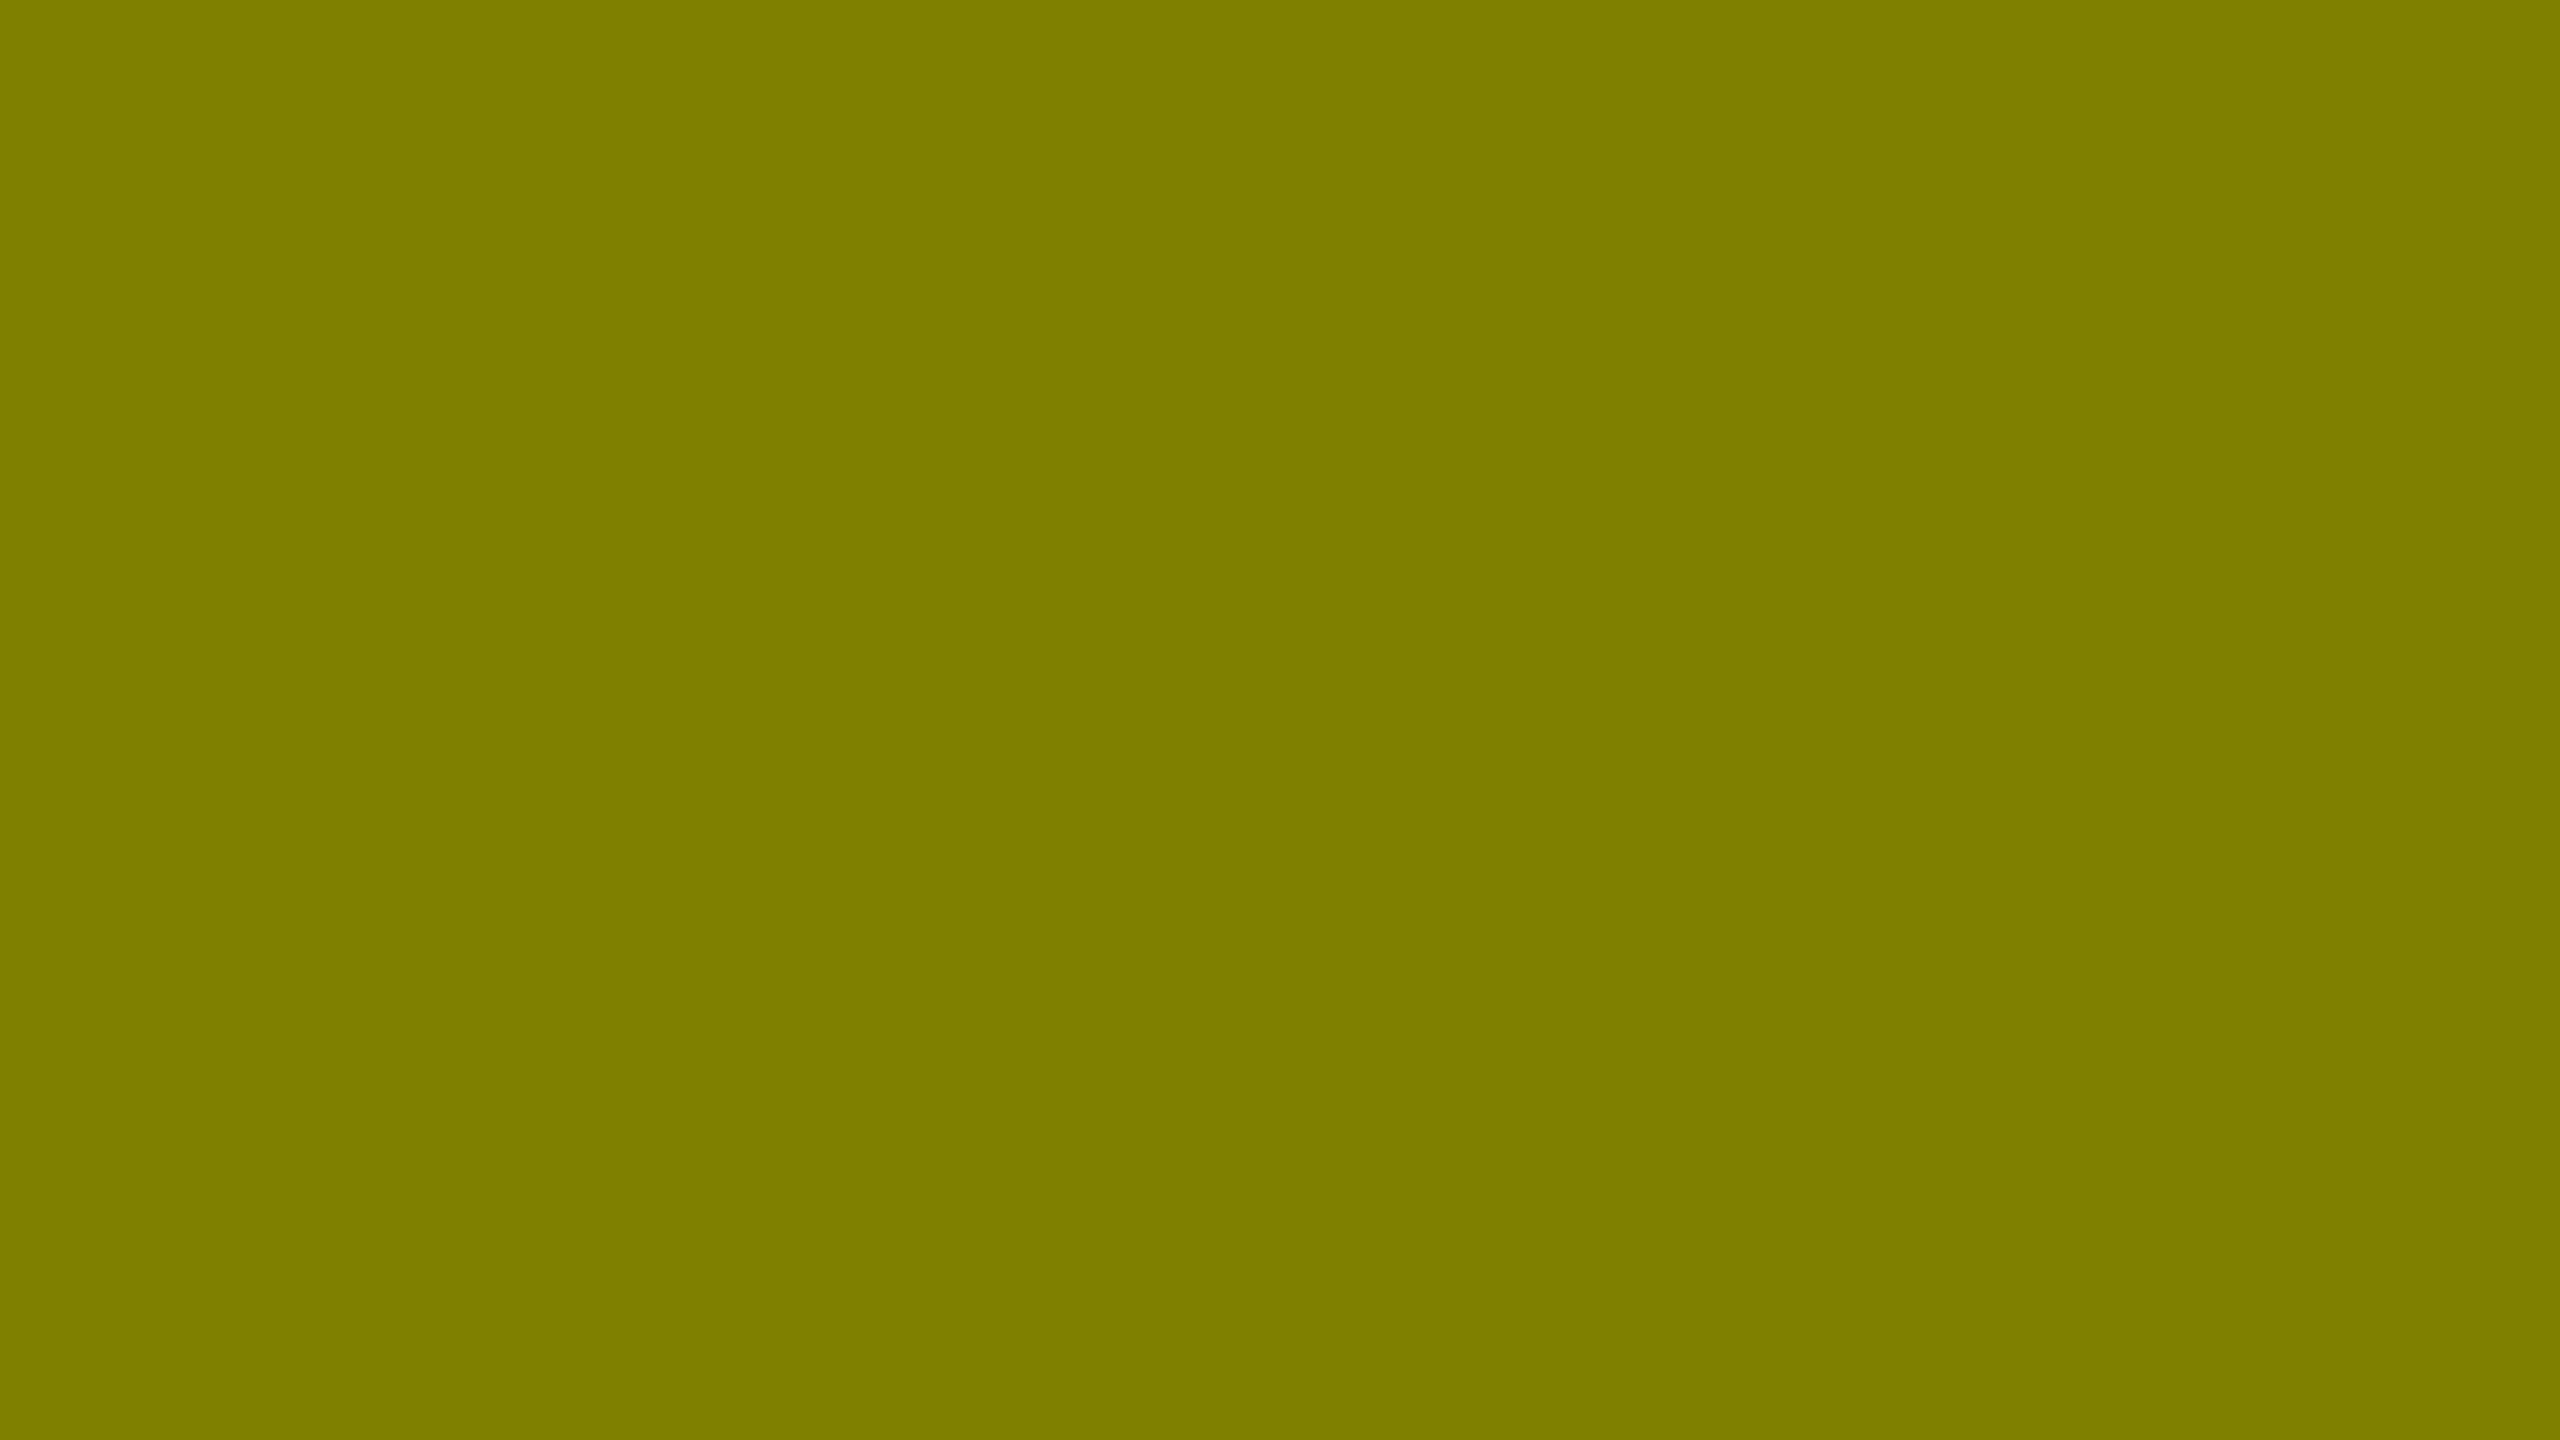 2560x1440 Olive Solid Color Background